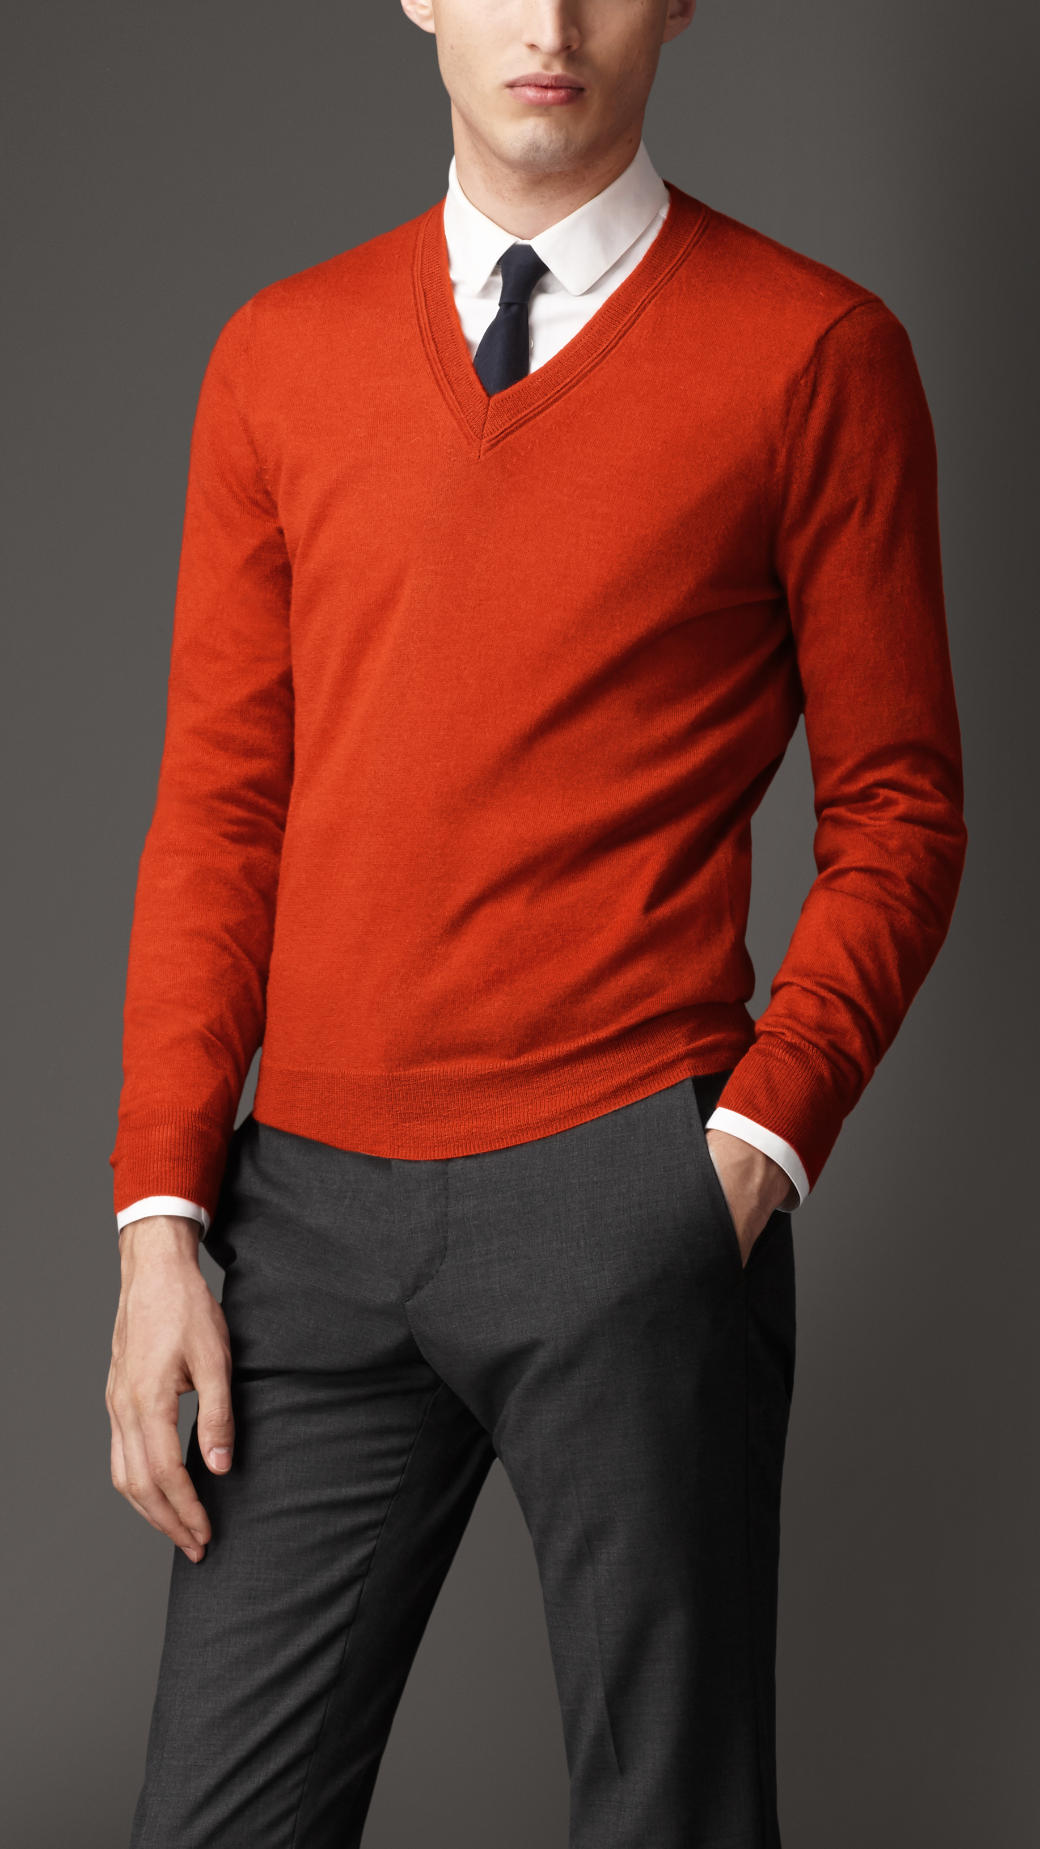 709e9952d2d Burberry Orange Vneck Cashmere Sweater for men